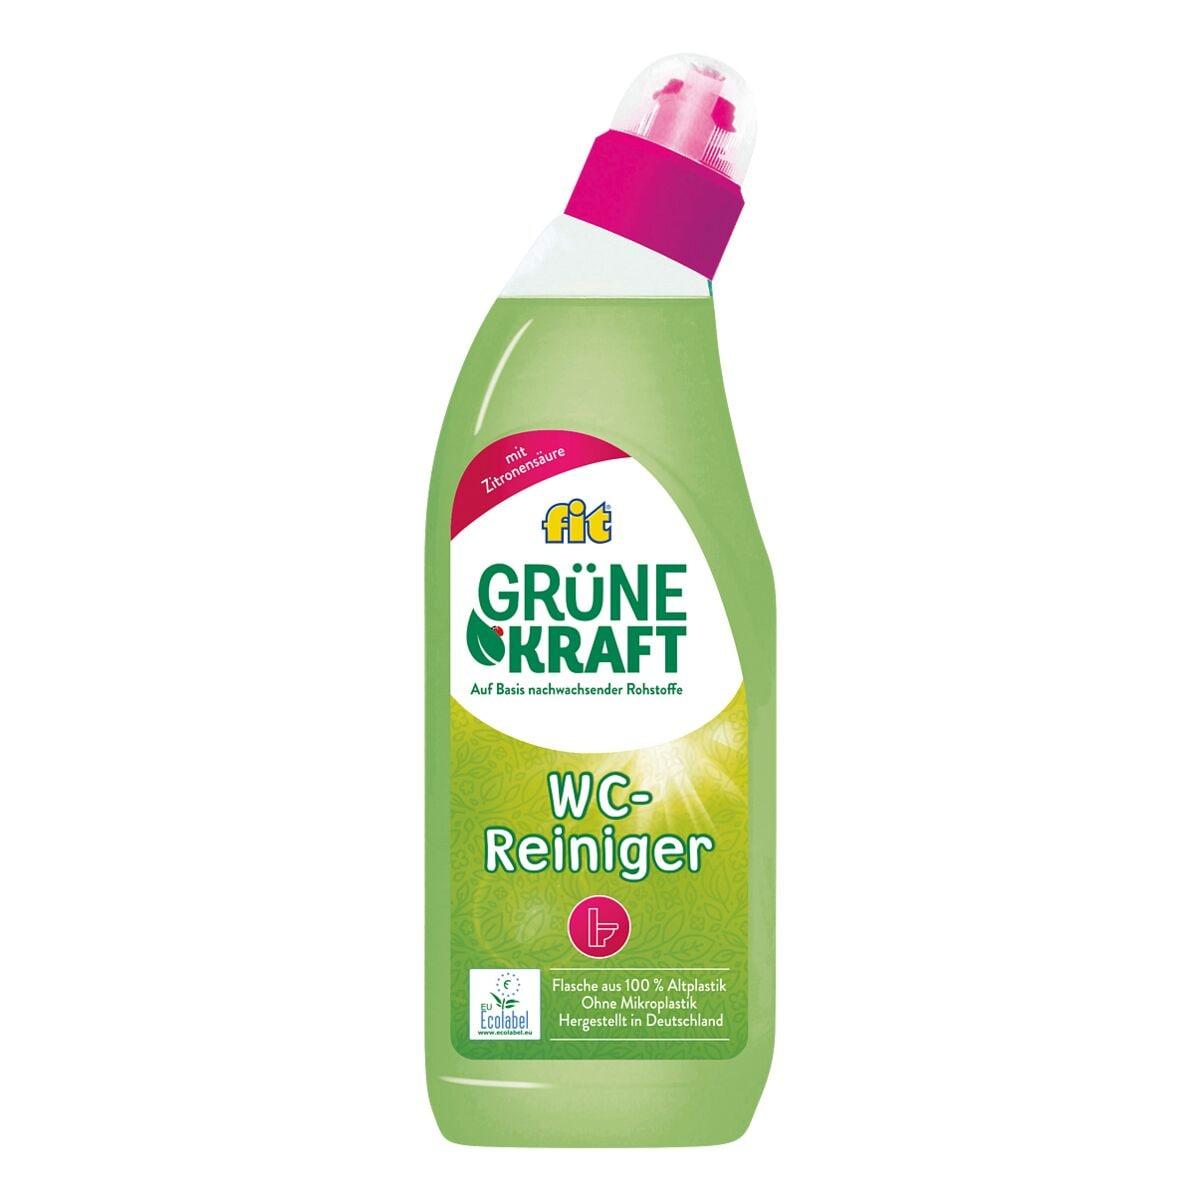 fit GRÜNEKRAFT WC-Reiniger »fit Grüne Kraft«